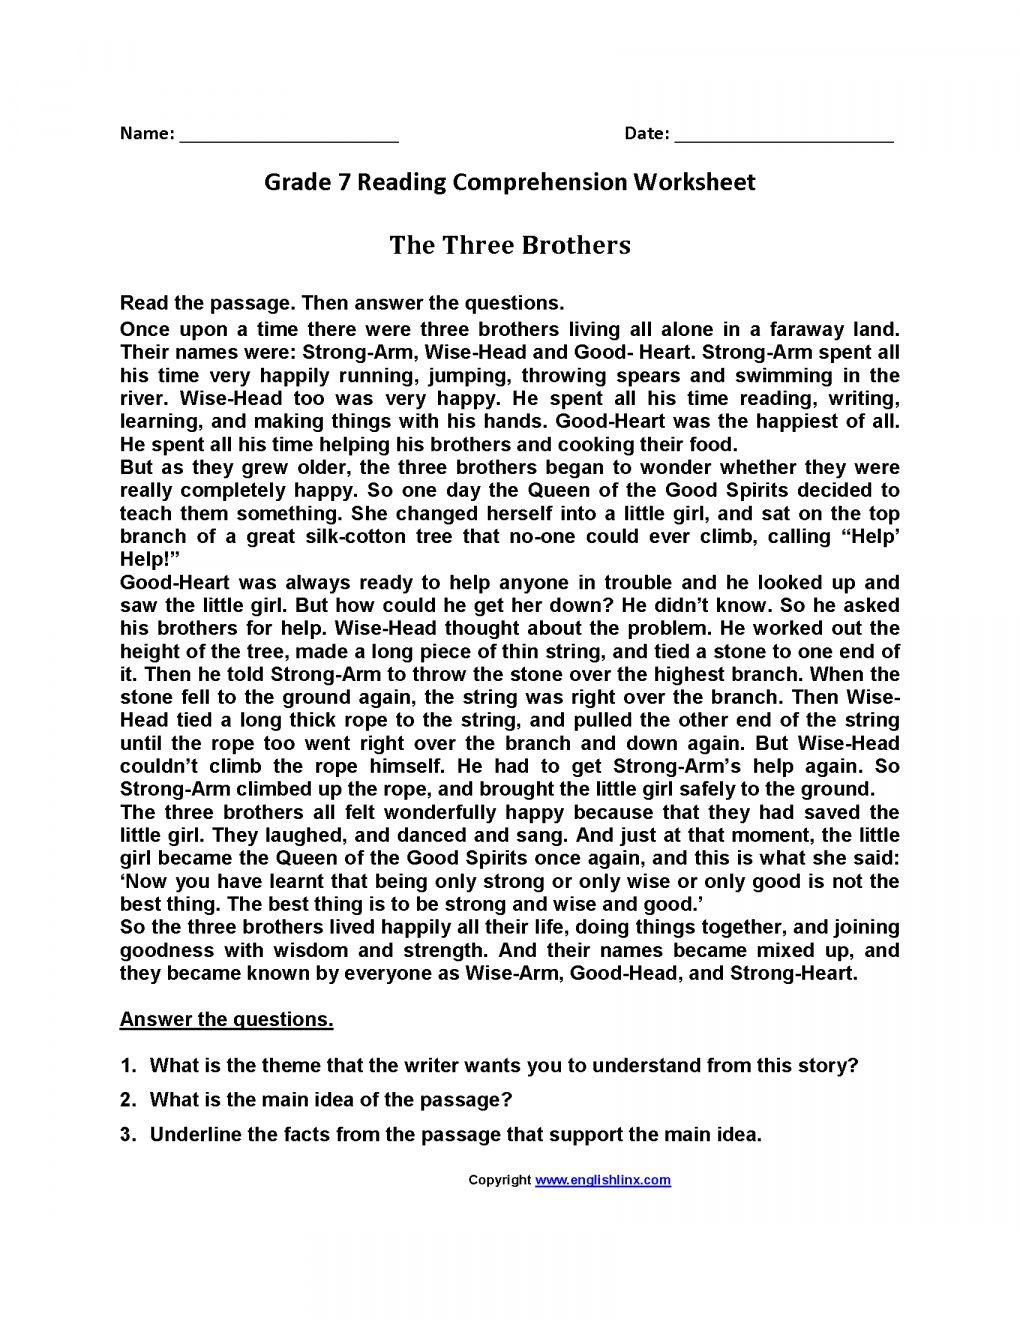 Reading Comprehension Worksheets 7th Grade 12 7th Grade Summarizing Worksheet